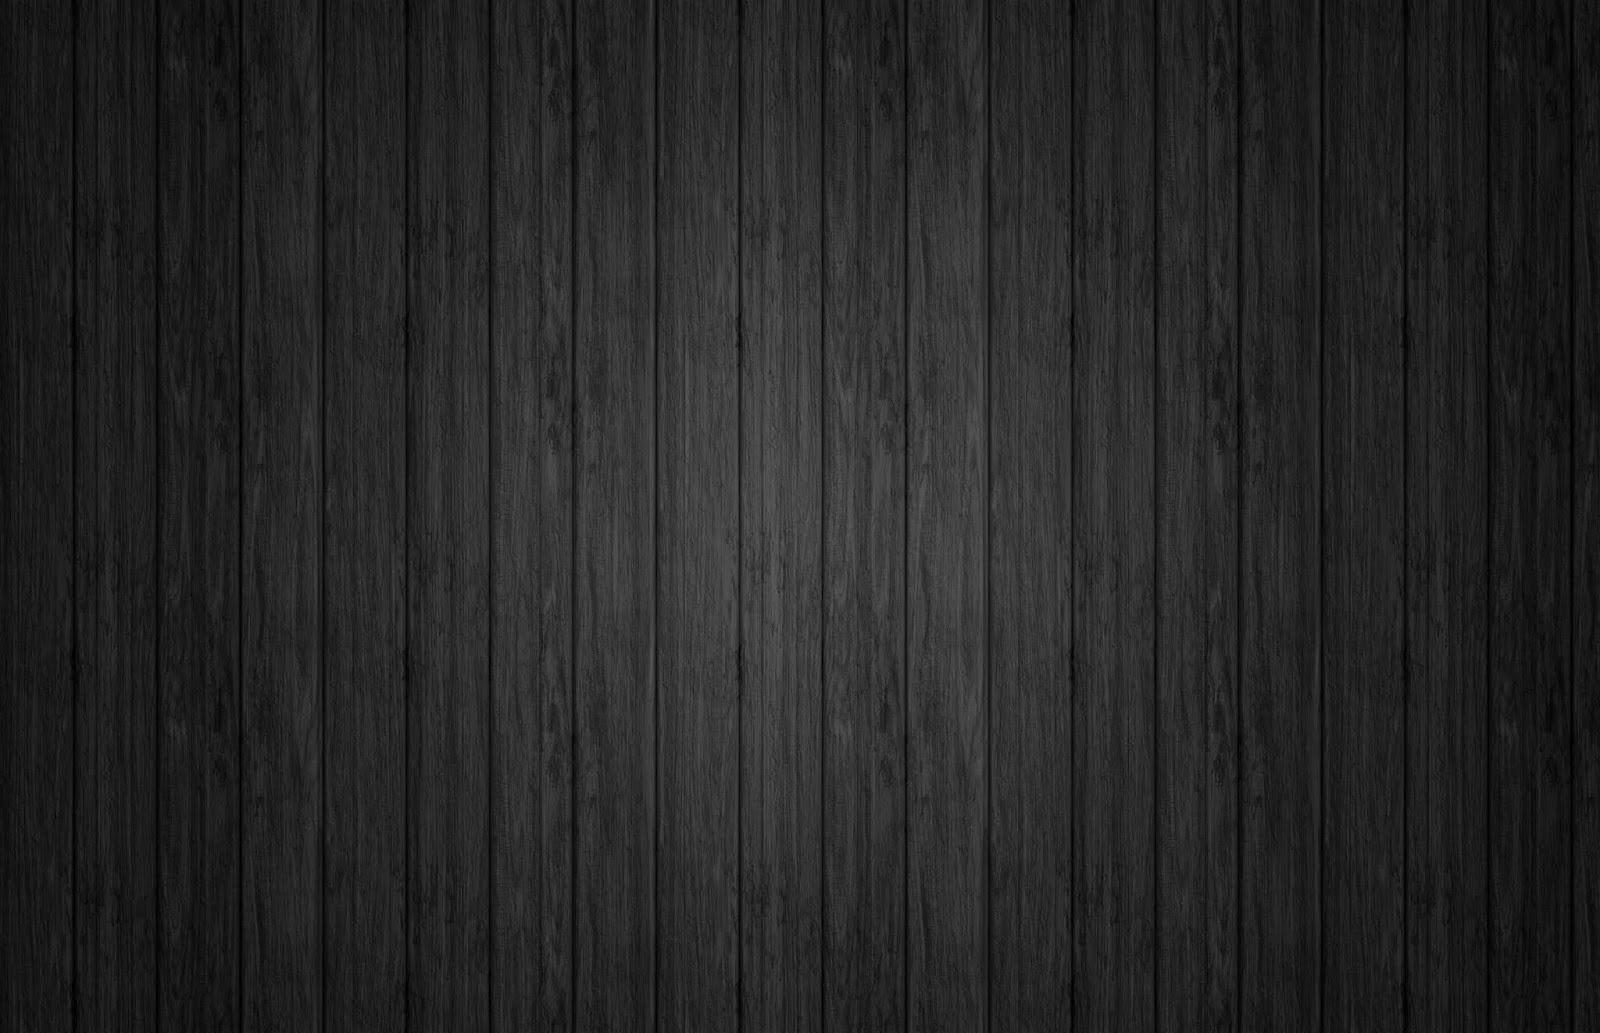 Plain-design-pattern-dark-background-image-HD-resolution-latest-pack.jpg